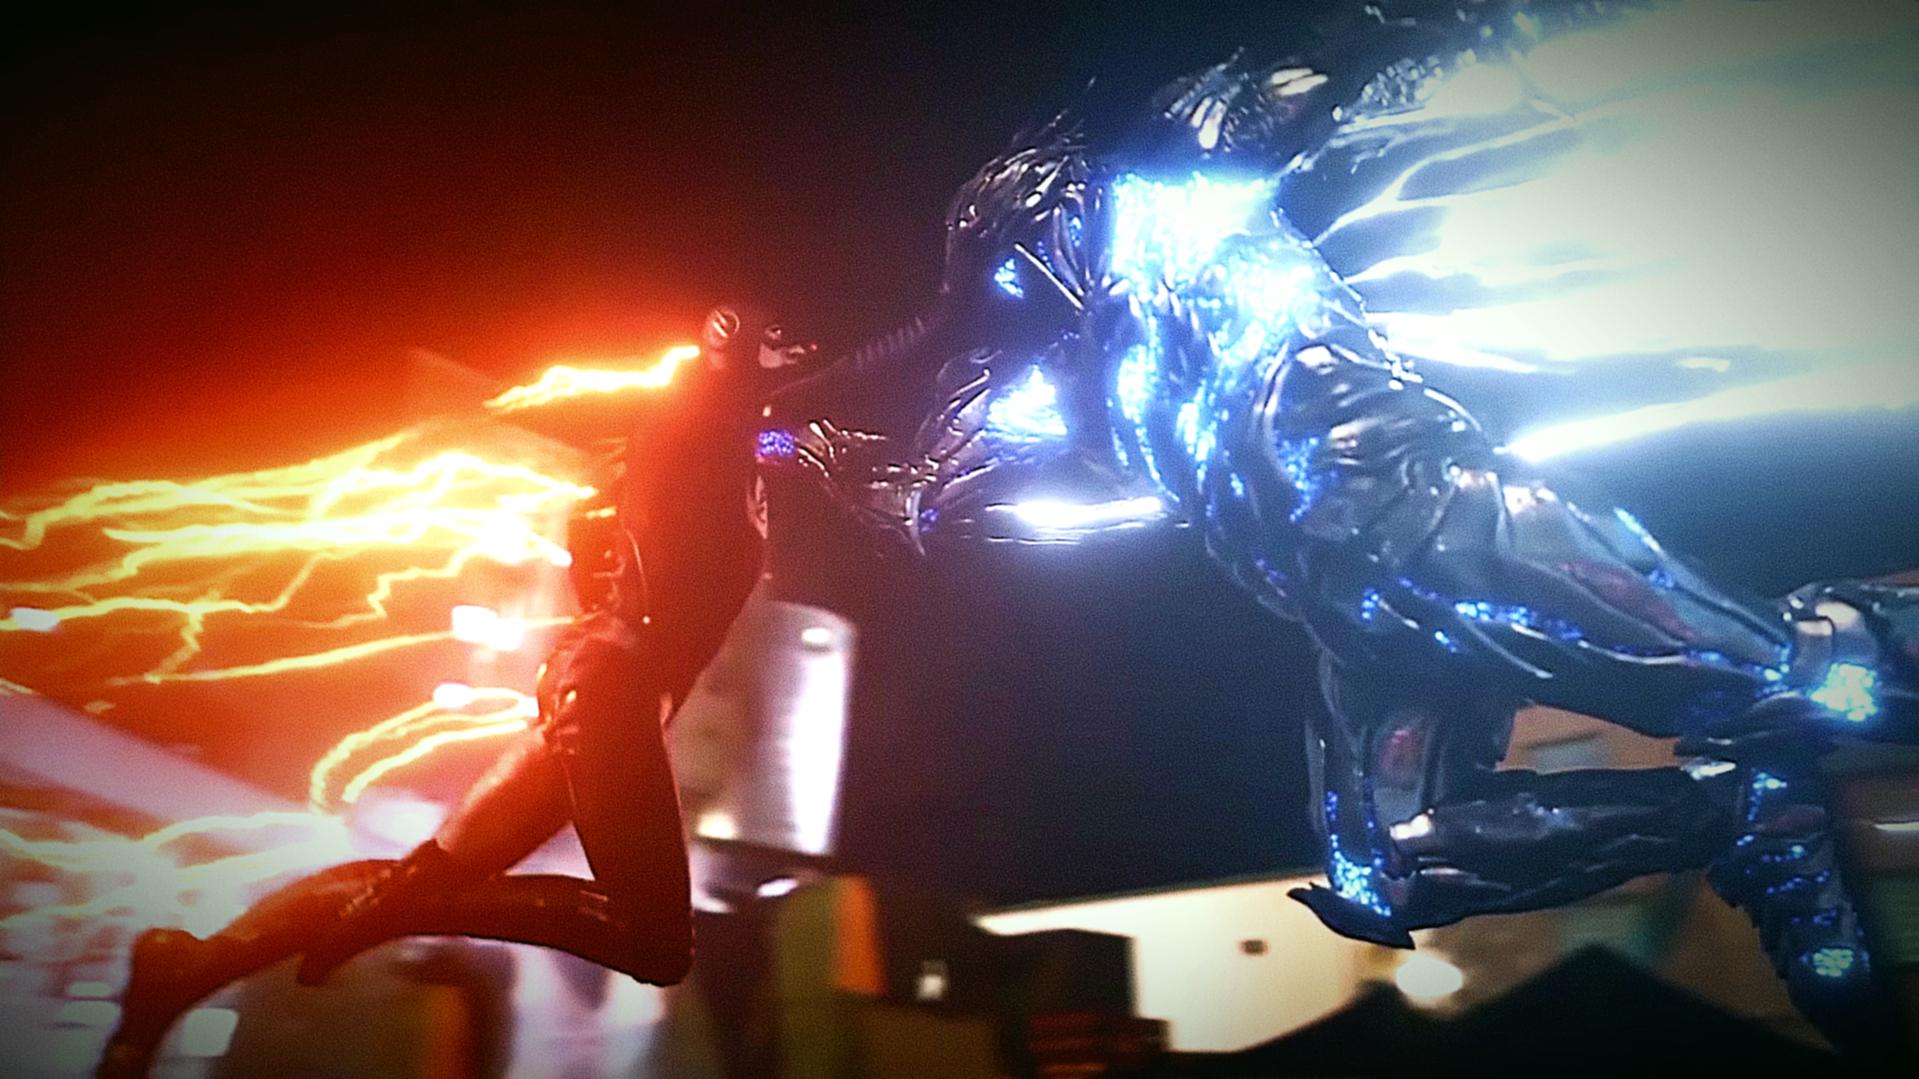 The Flash 3x07 - Flash vs Savitar - Opening Scene Image'